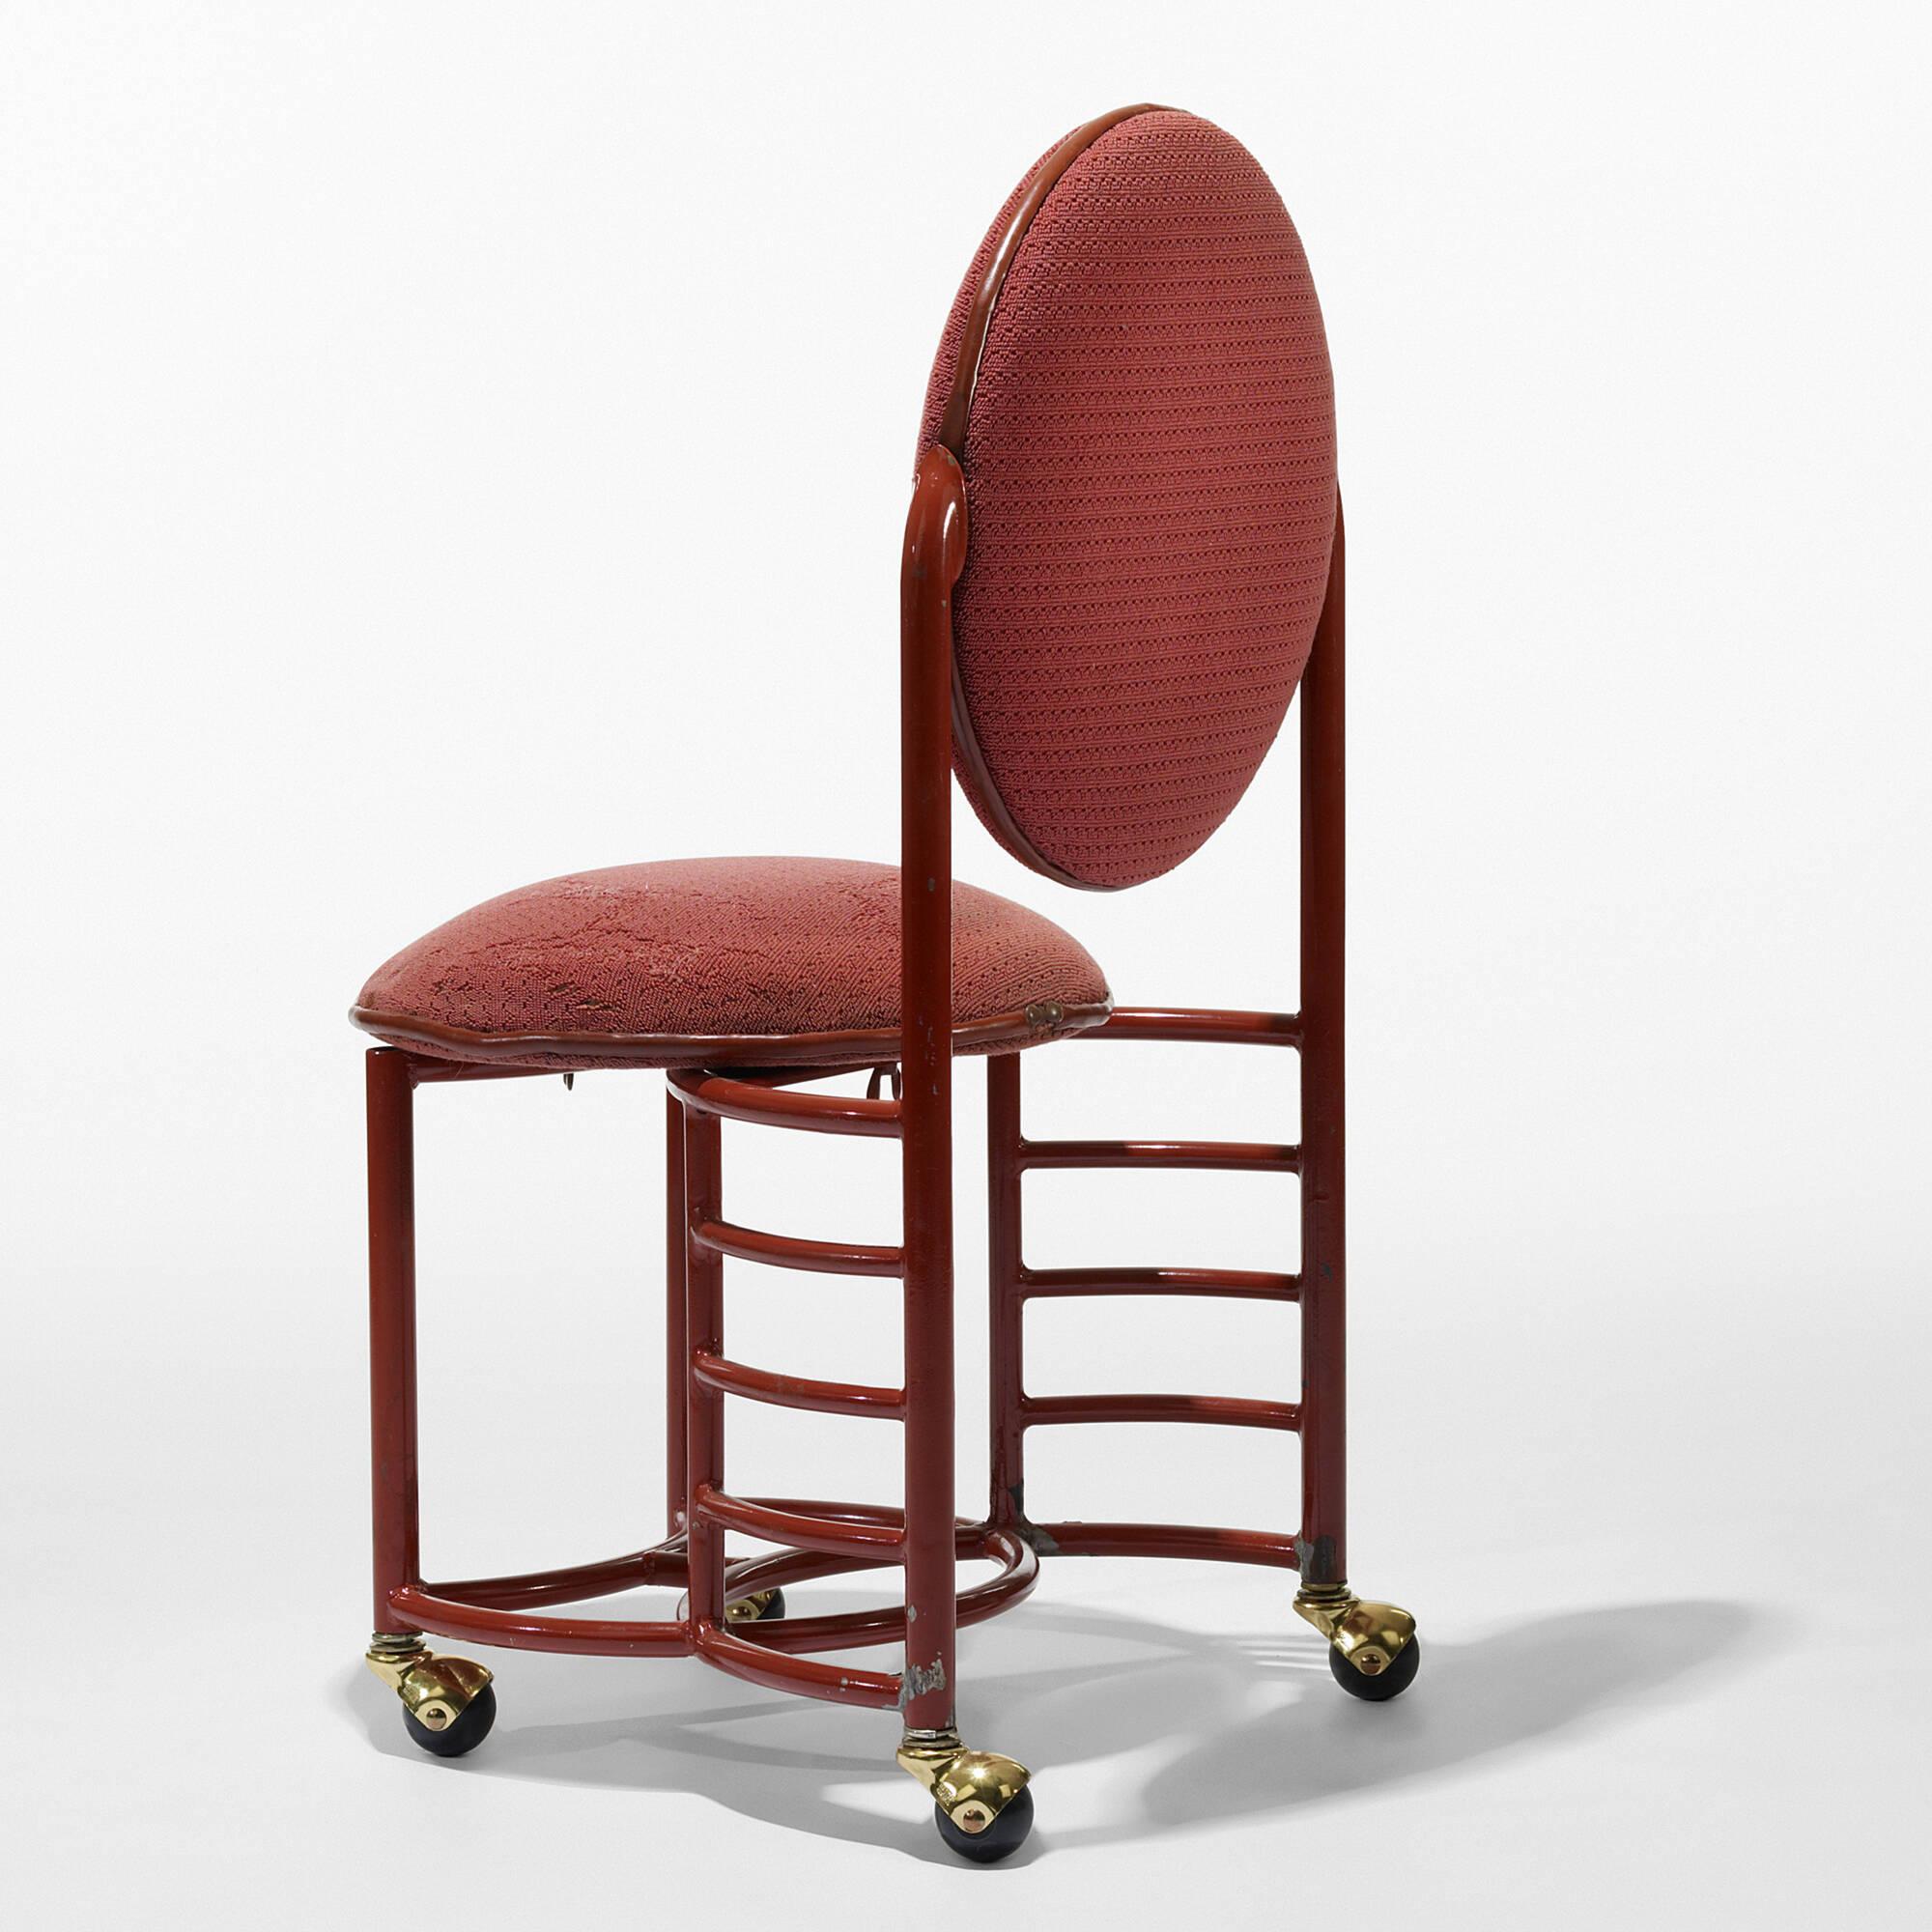 247 Frank Lloyd Wright Chair From The Johnson Wax Building Racine Wisconsin